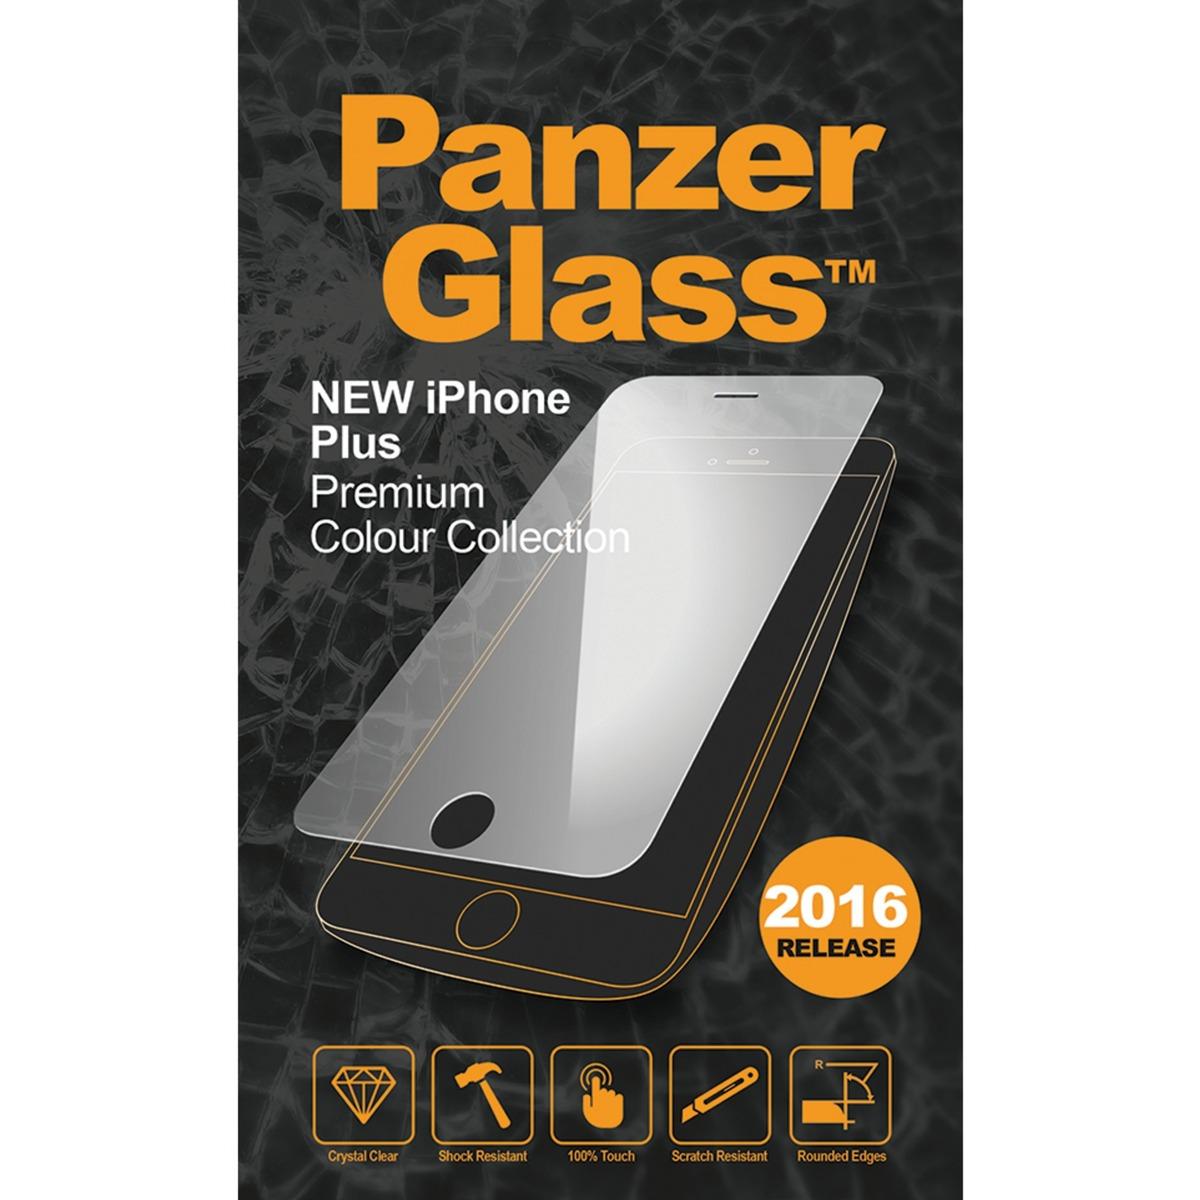 2006 Clear screen protector iPhone 1pieza(s) protector de pantalla, Película protectora